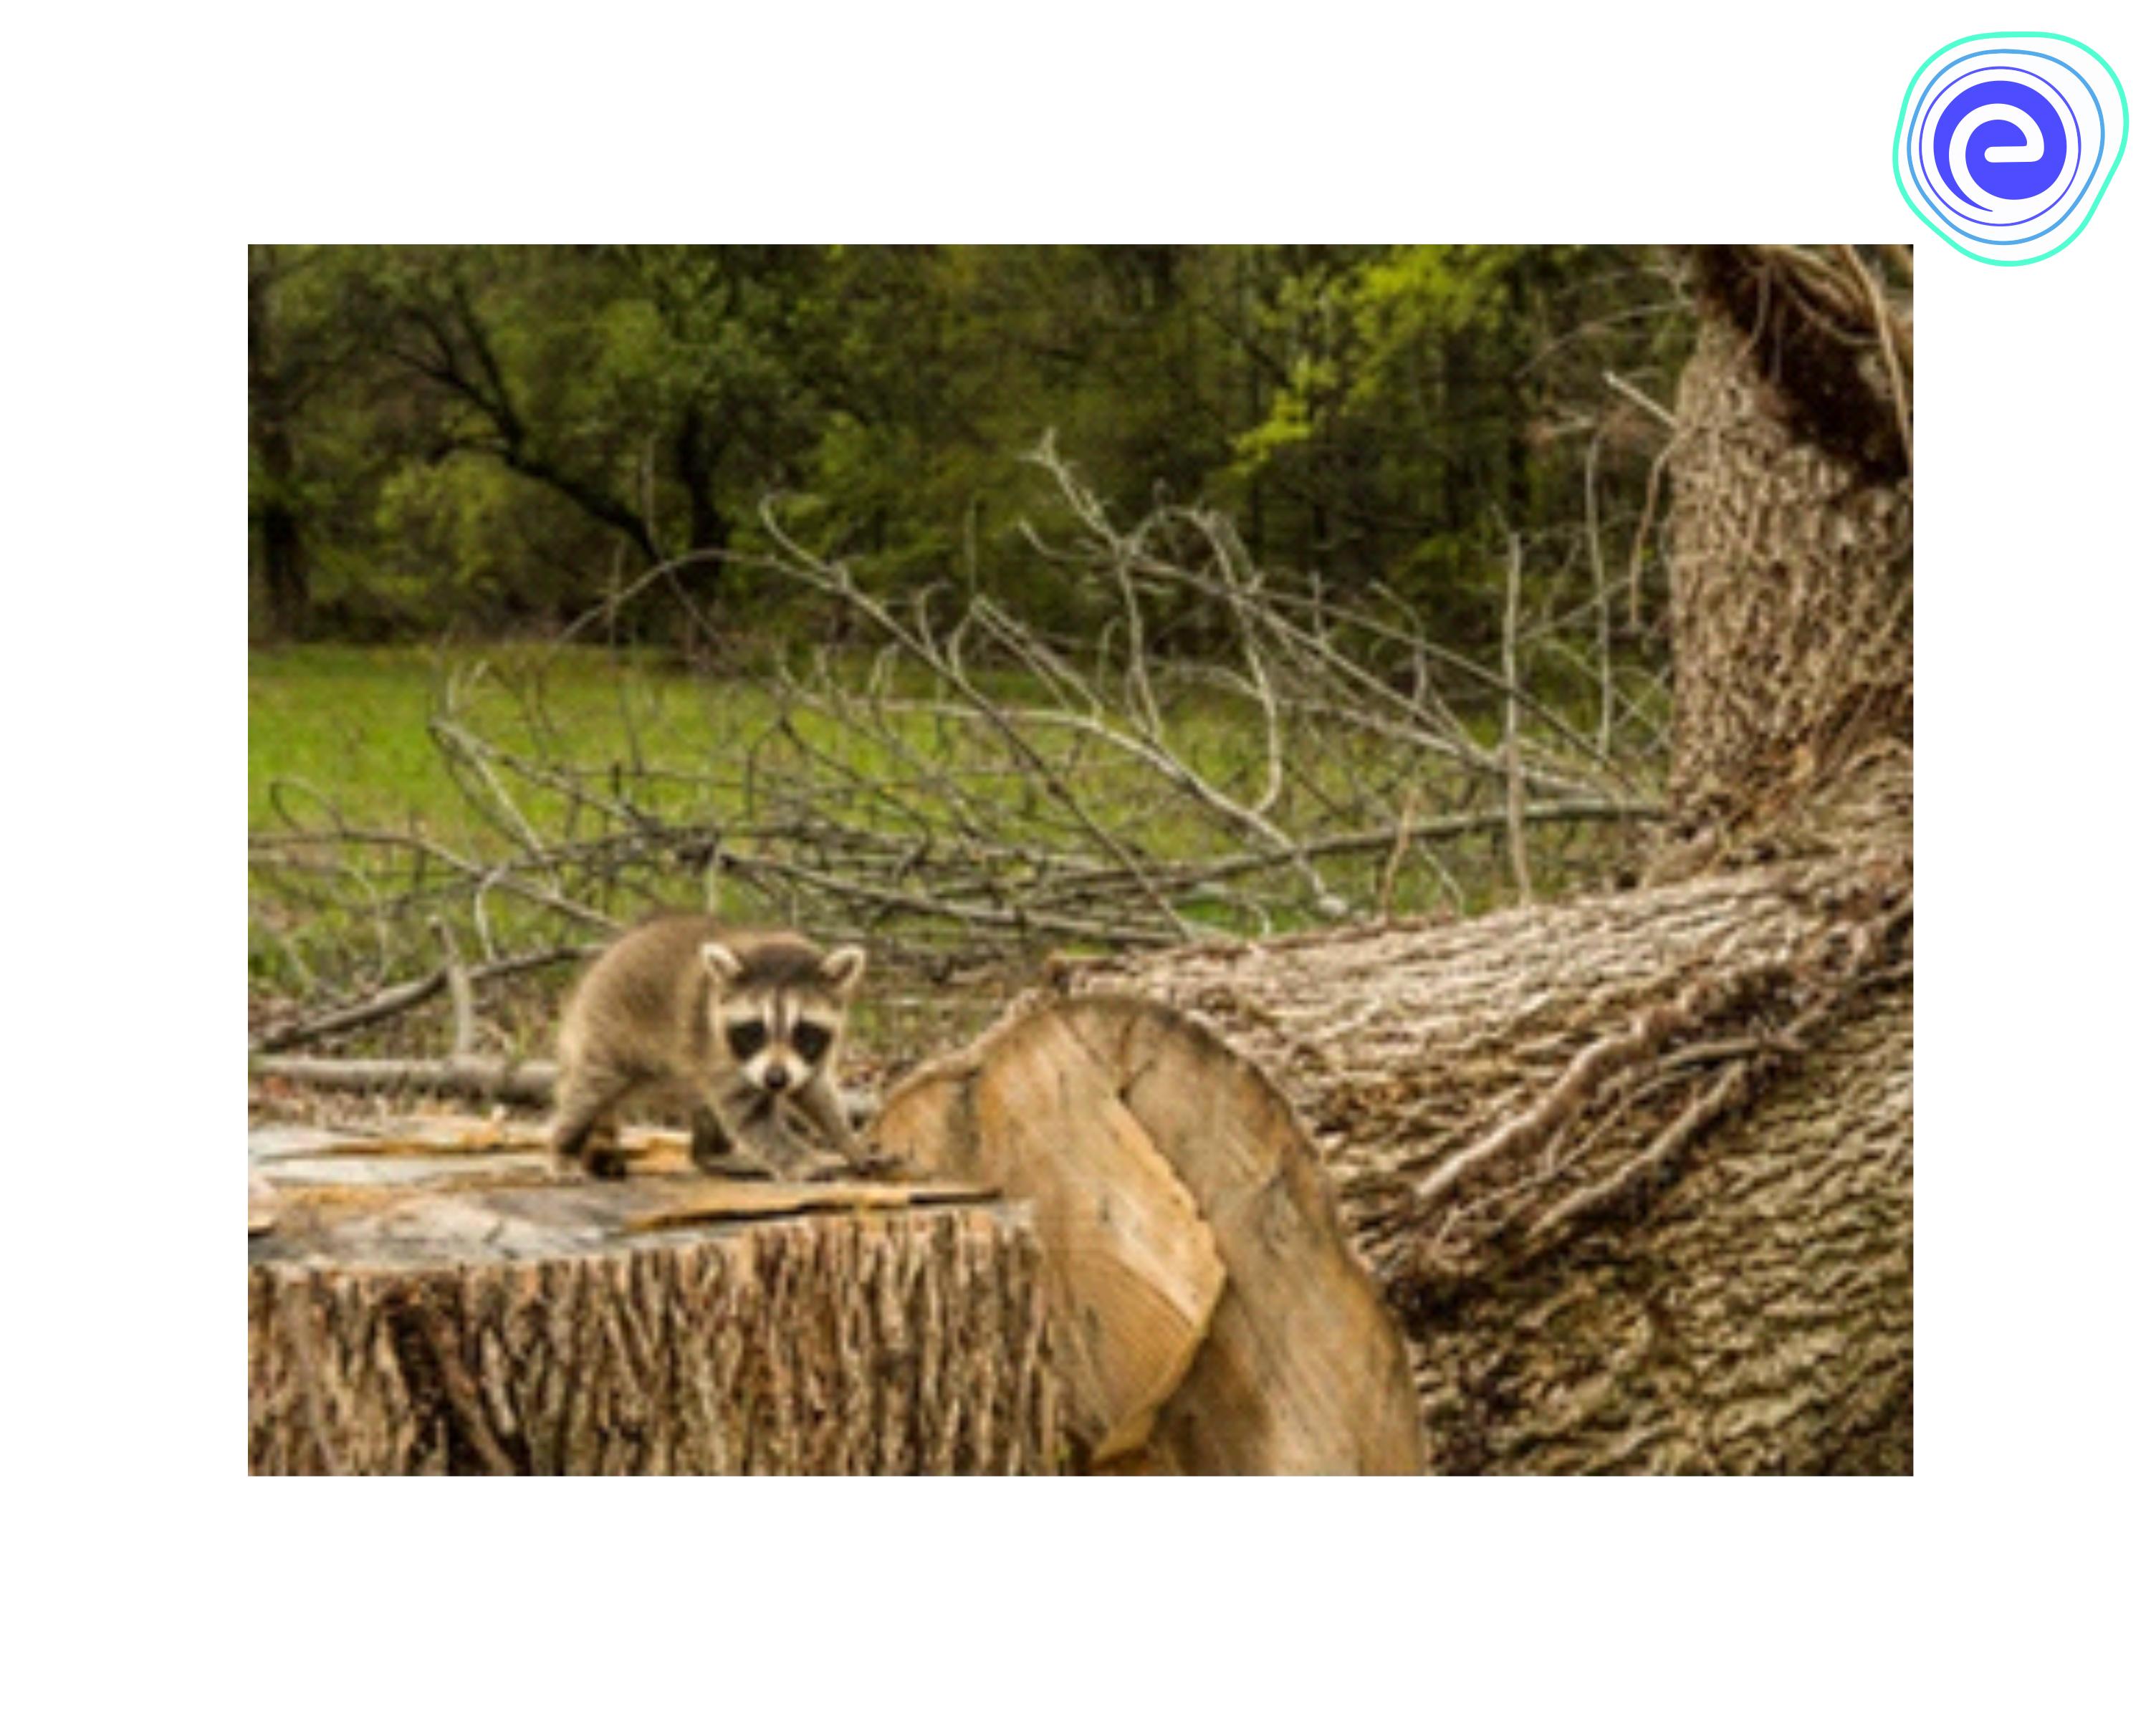 Deforestation Disturb Animal Life In The Forest